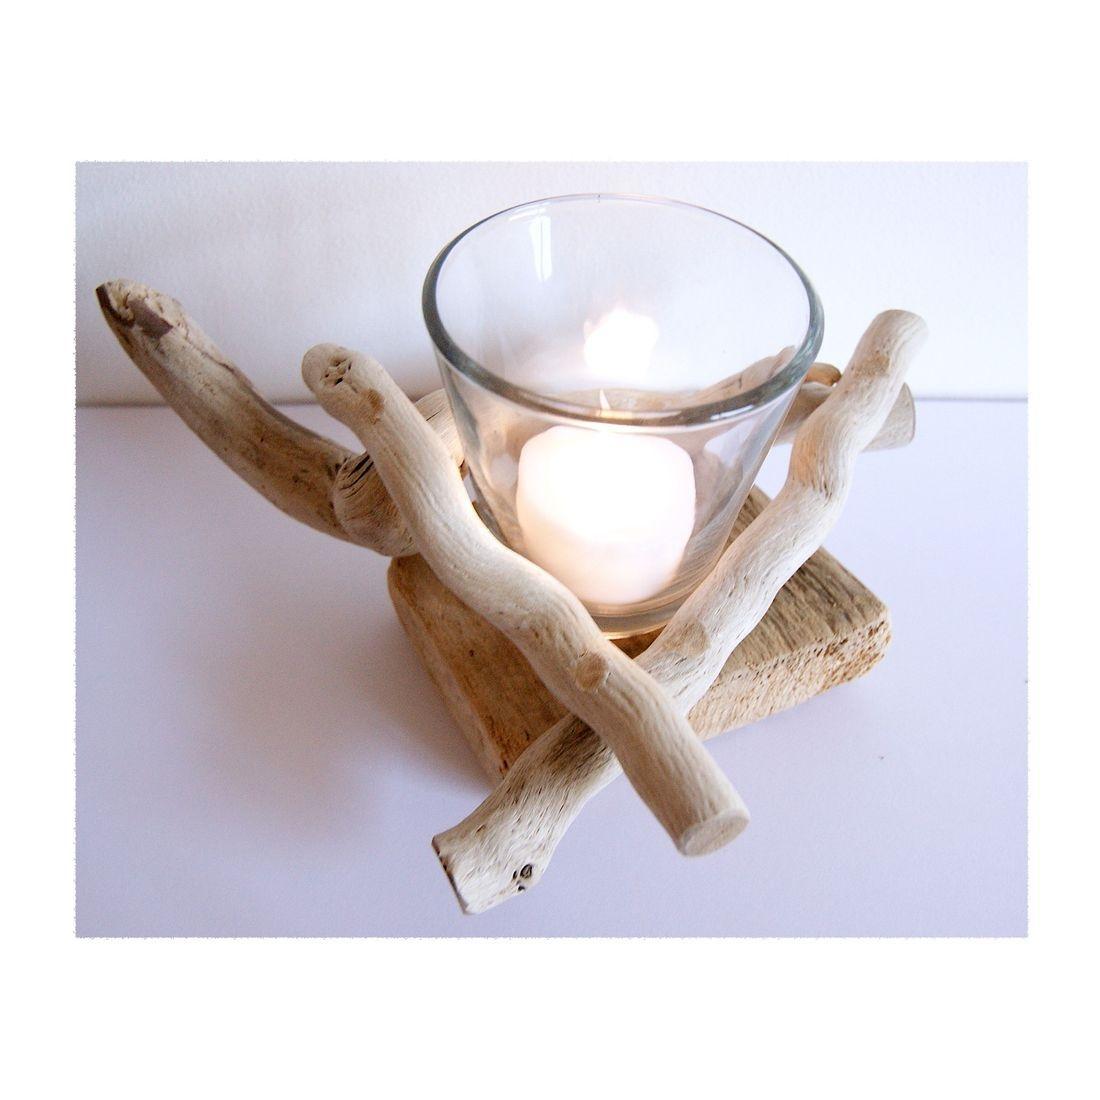 Driftwood candle tea light holder 9